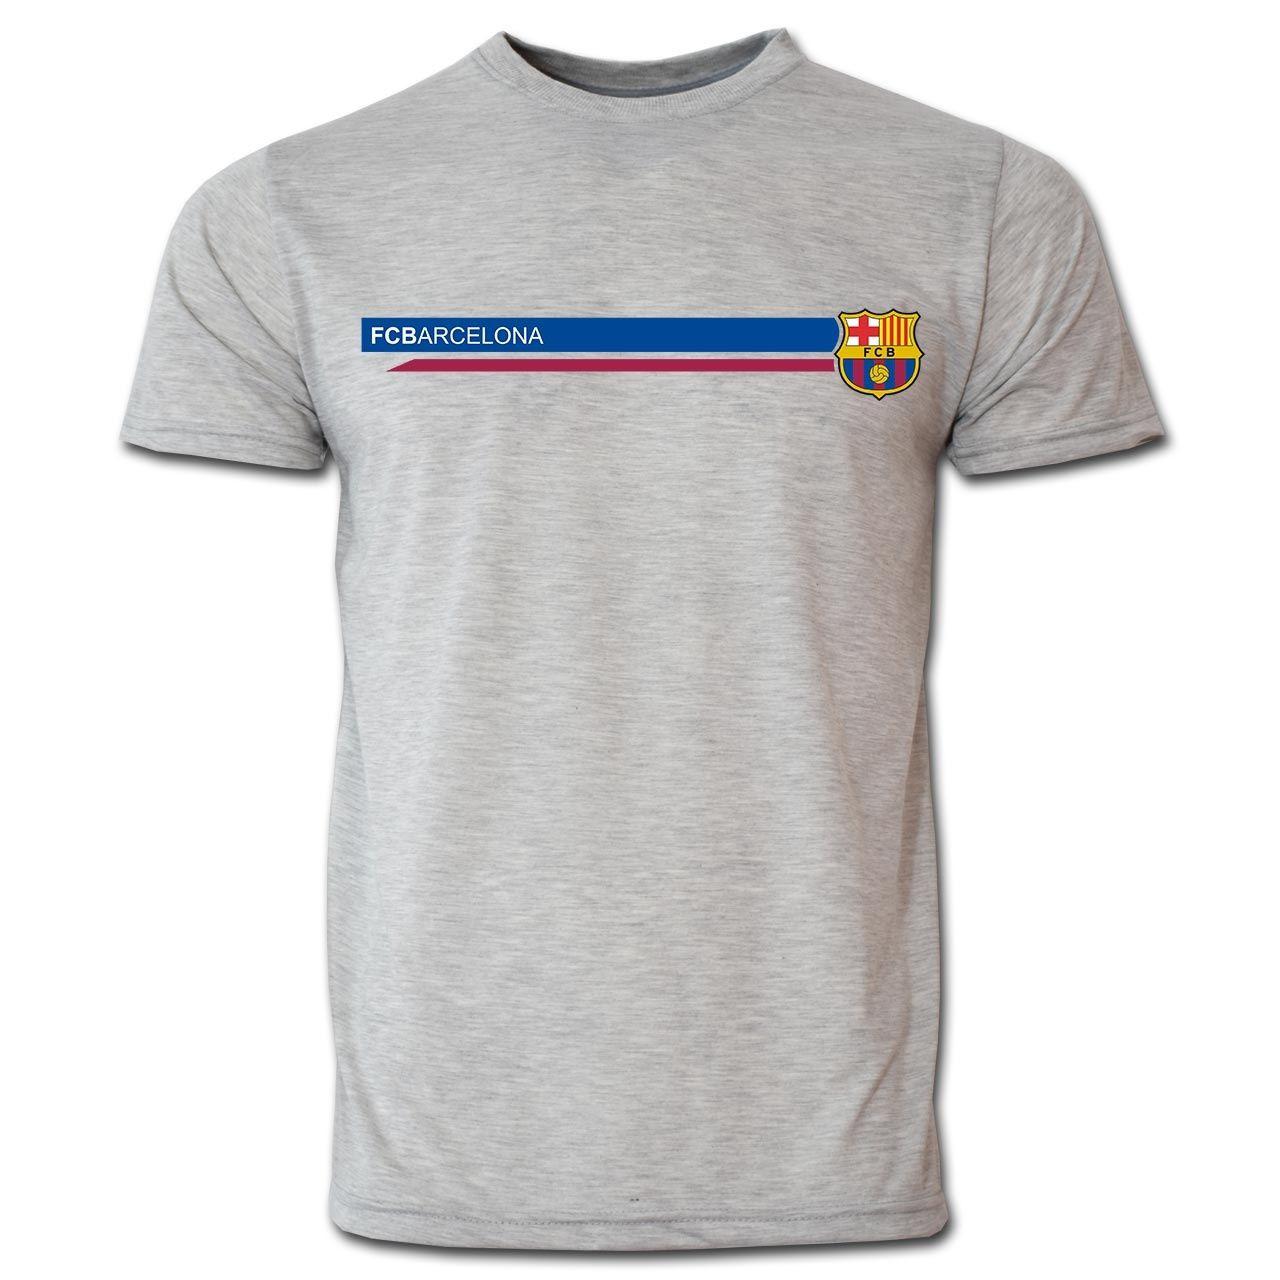 تیشرت مردانه بارسلونا کد B903 main 1 1